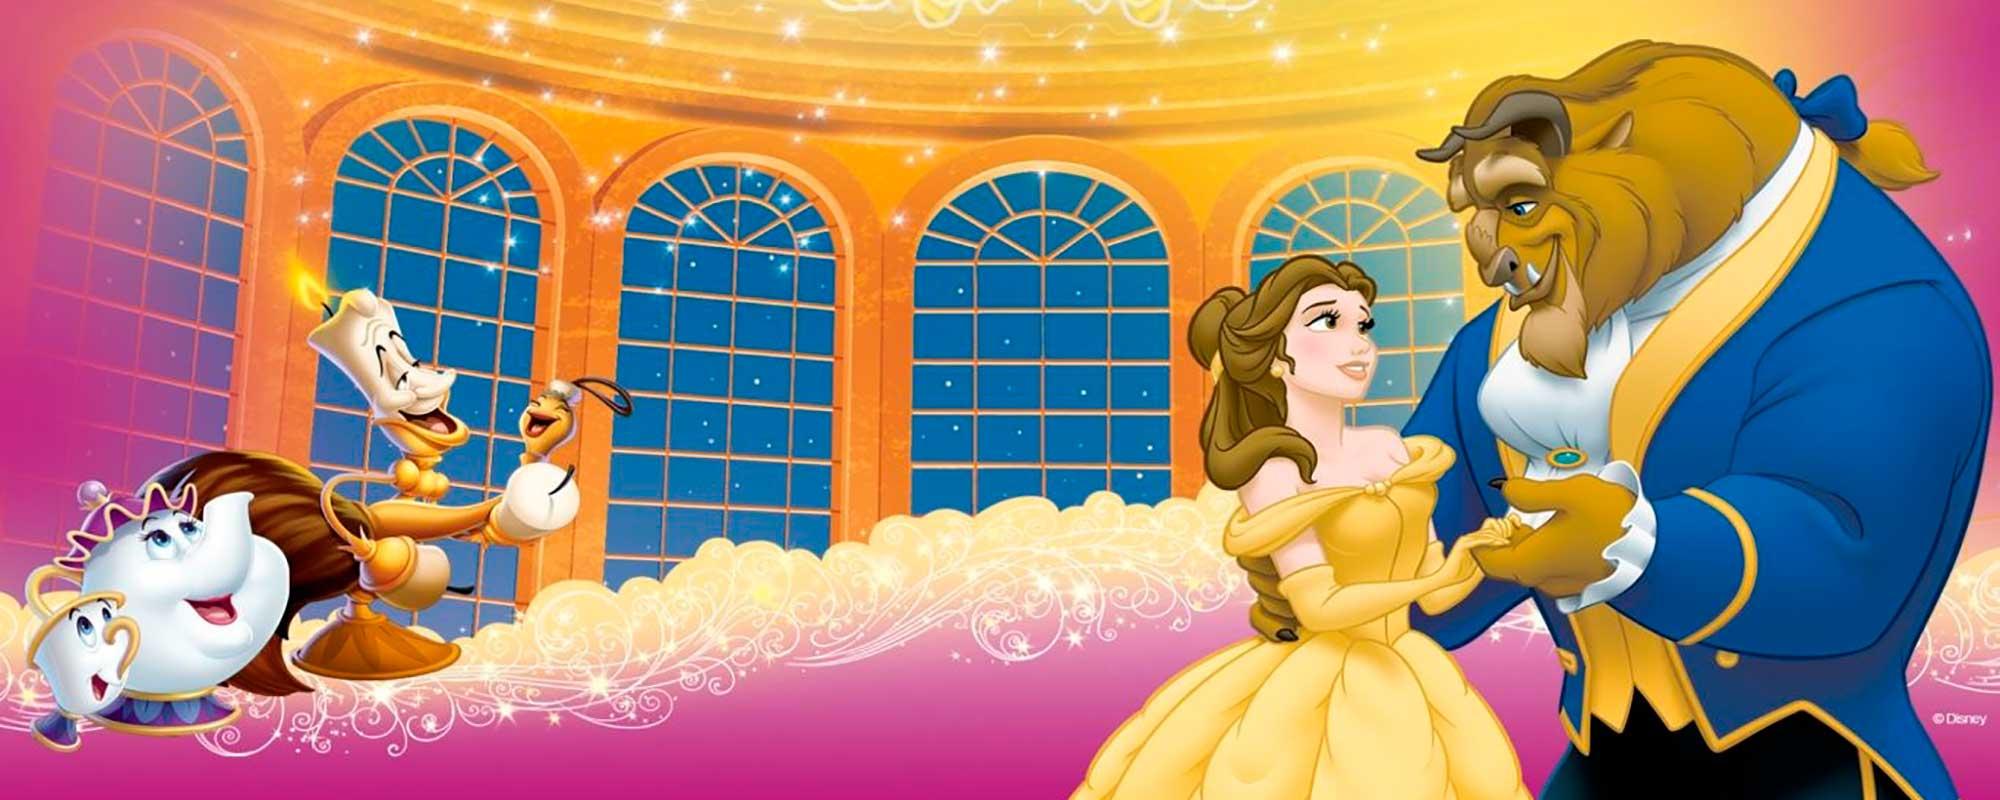 Bella princesa disney